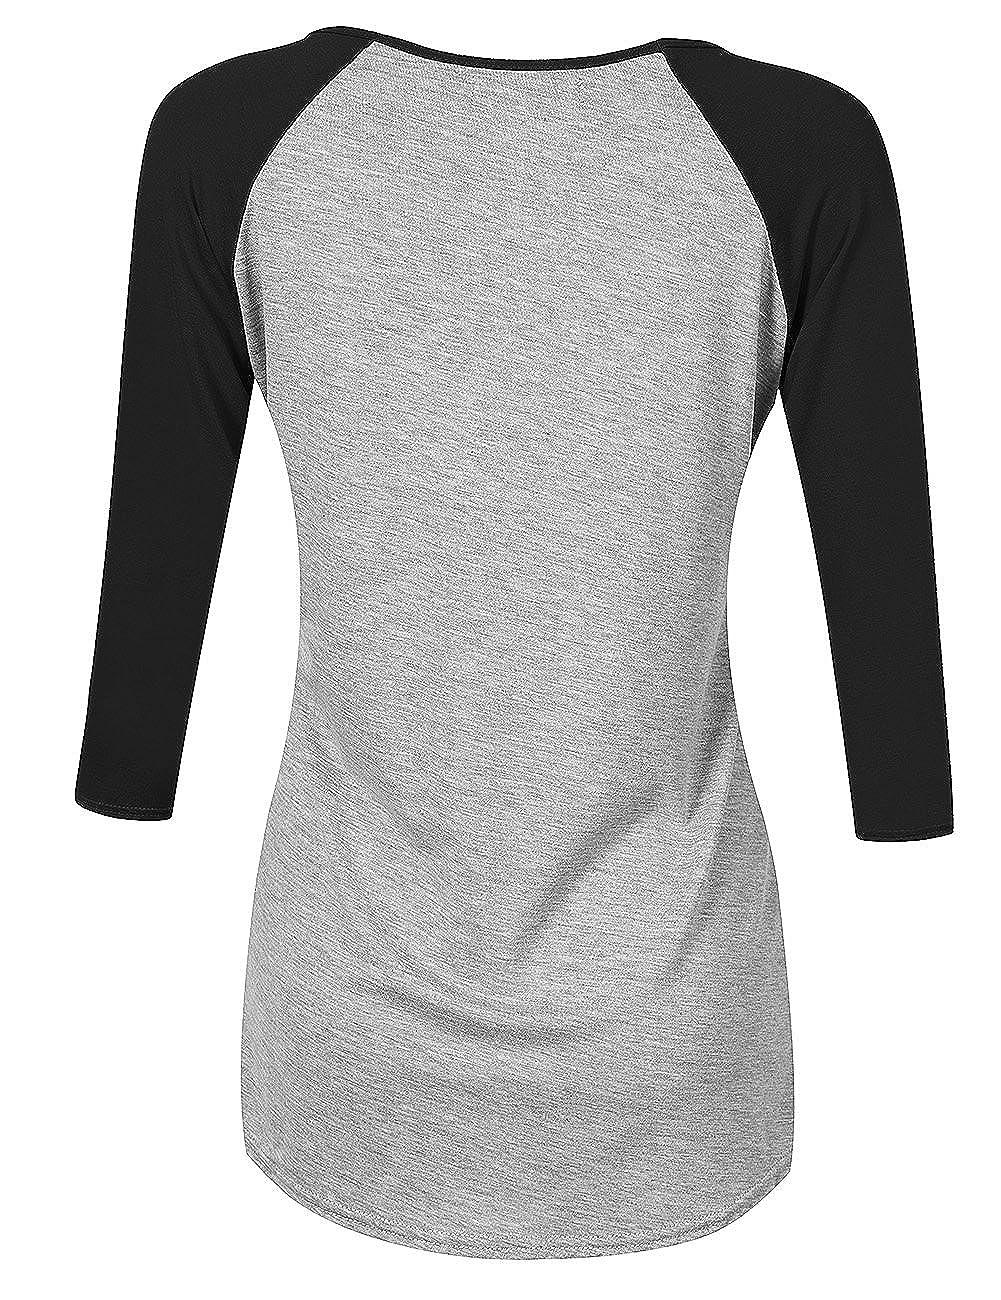 9f49e91056 Amazon.com: Leadingstar Womens Athletic V Neck Shirt 3/4 Contrast Raglan  Sleeve Raglan T Shirt Tops Grey+Black S: Clothing